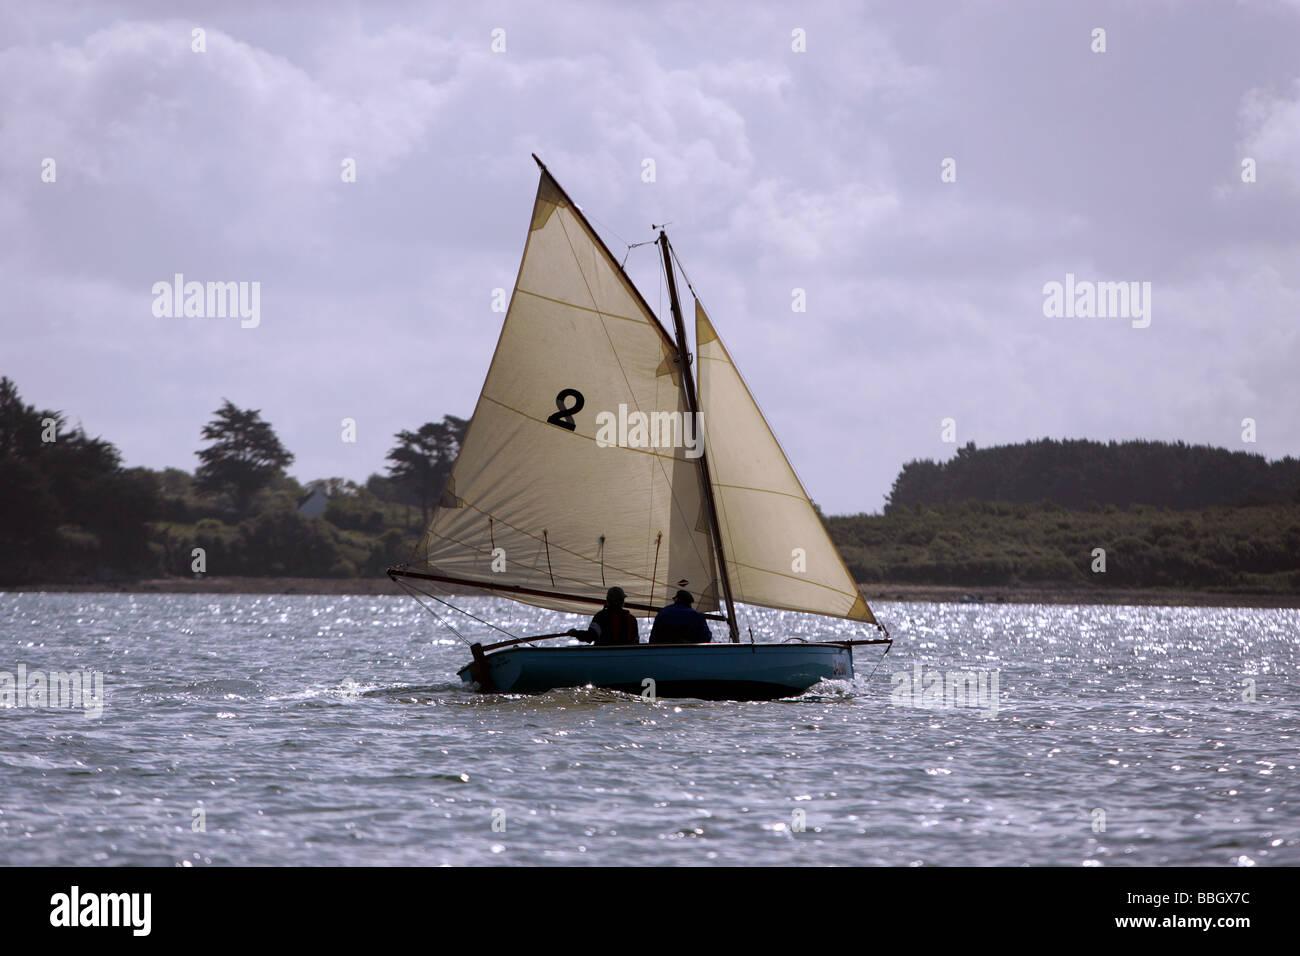 Small wooden sailboat, Golfe du Morbihan,  France - Stock Image